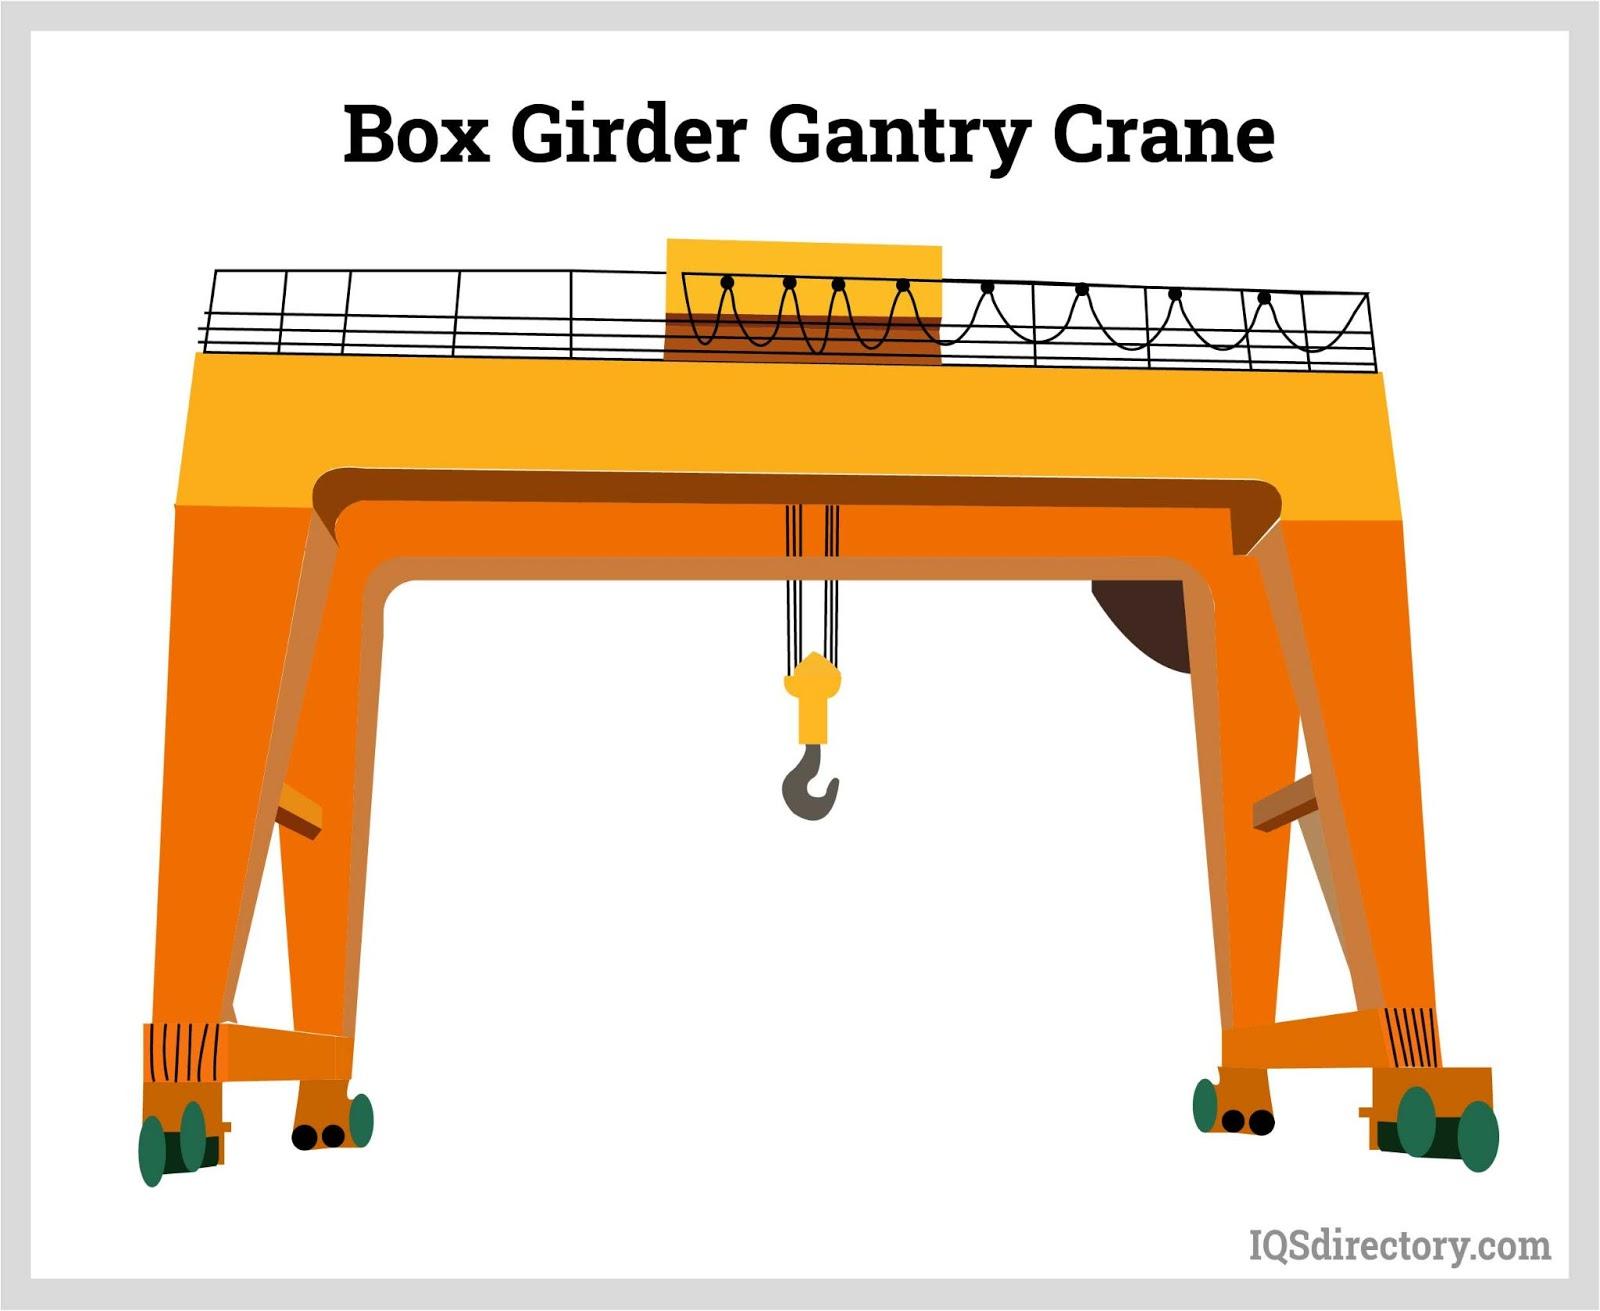 Box Girder Gantry Crane